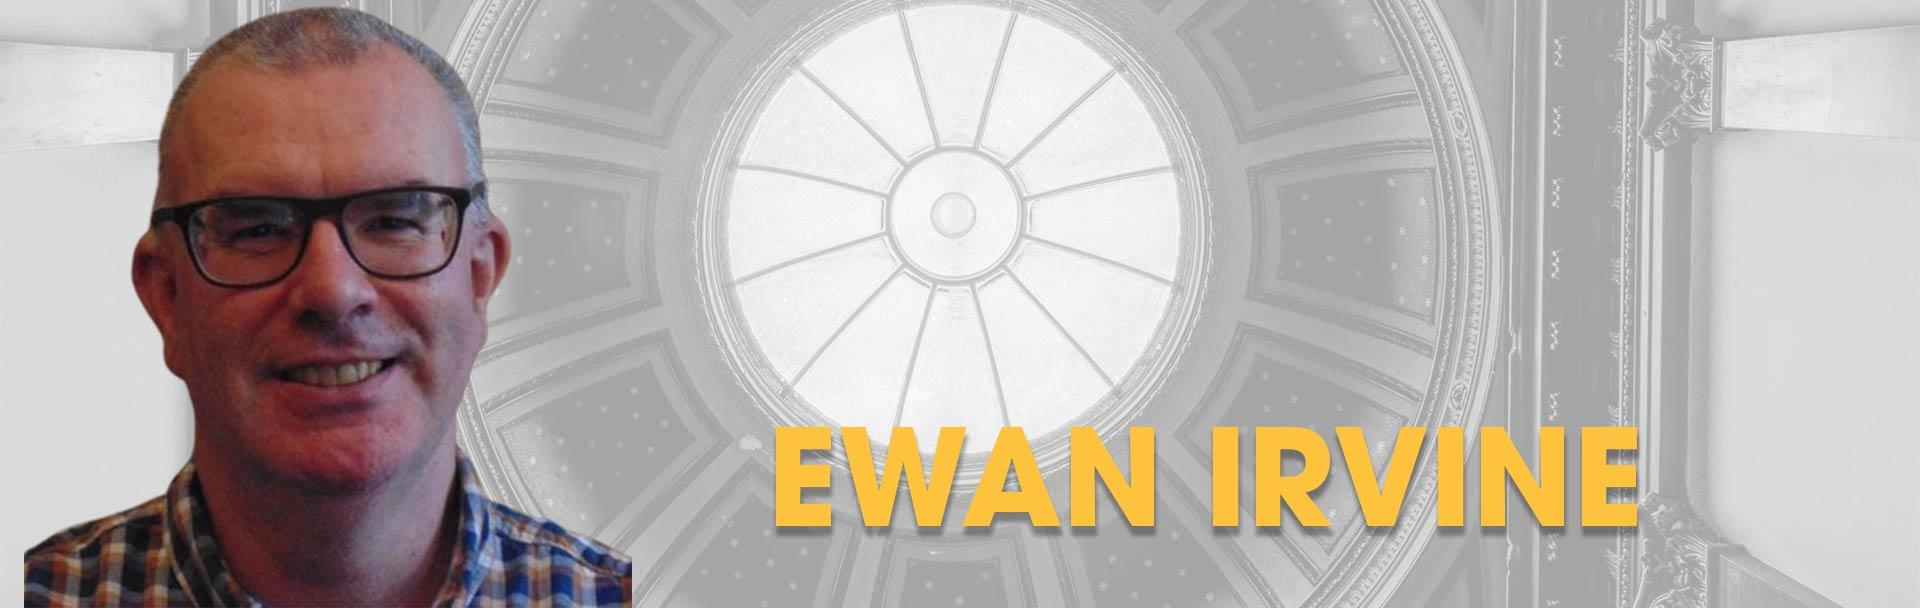 Ewan Irvine is part of Saturday Night Demonstrations of Mediumship at the Sir Arthur Conan Doyle Centre